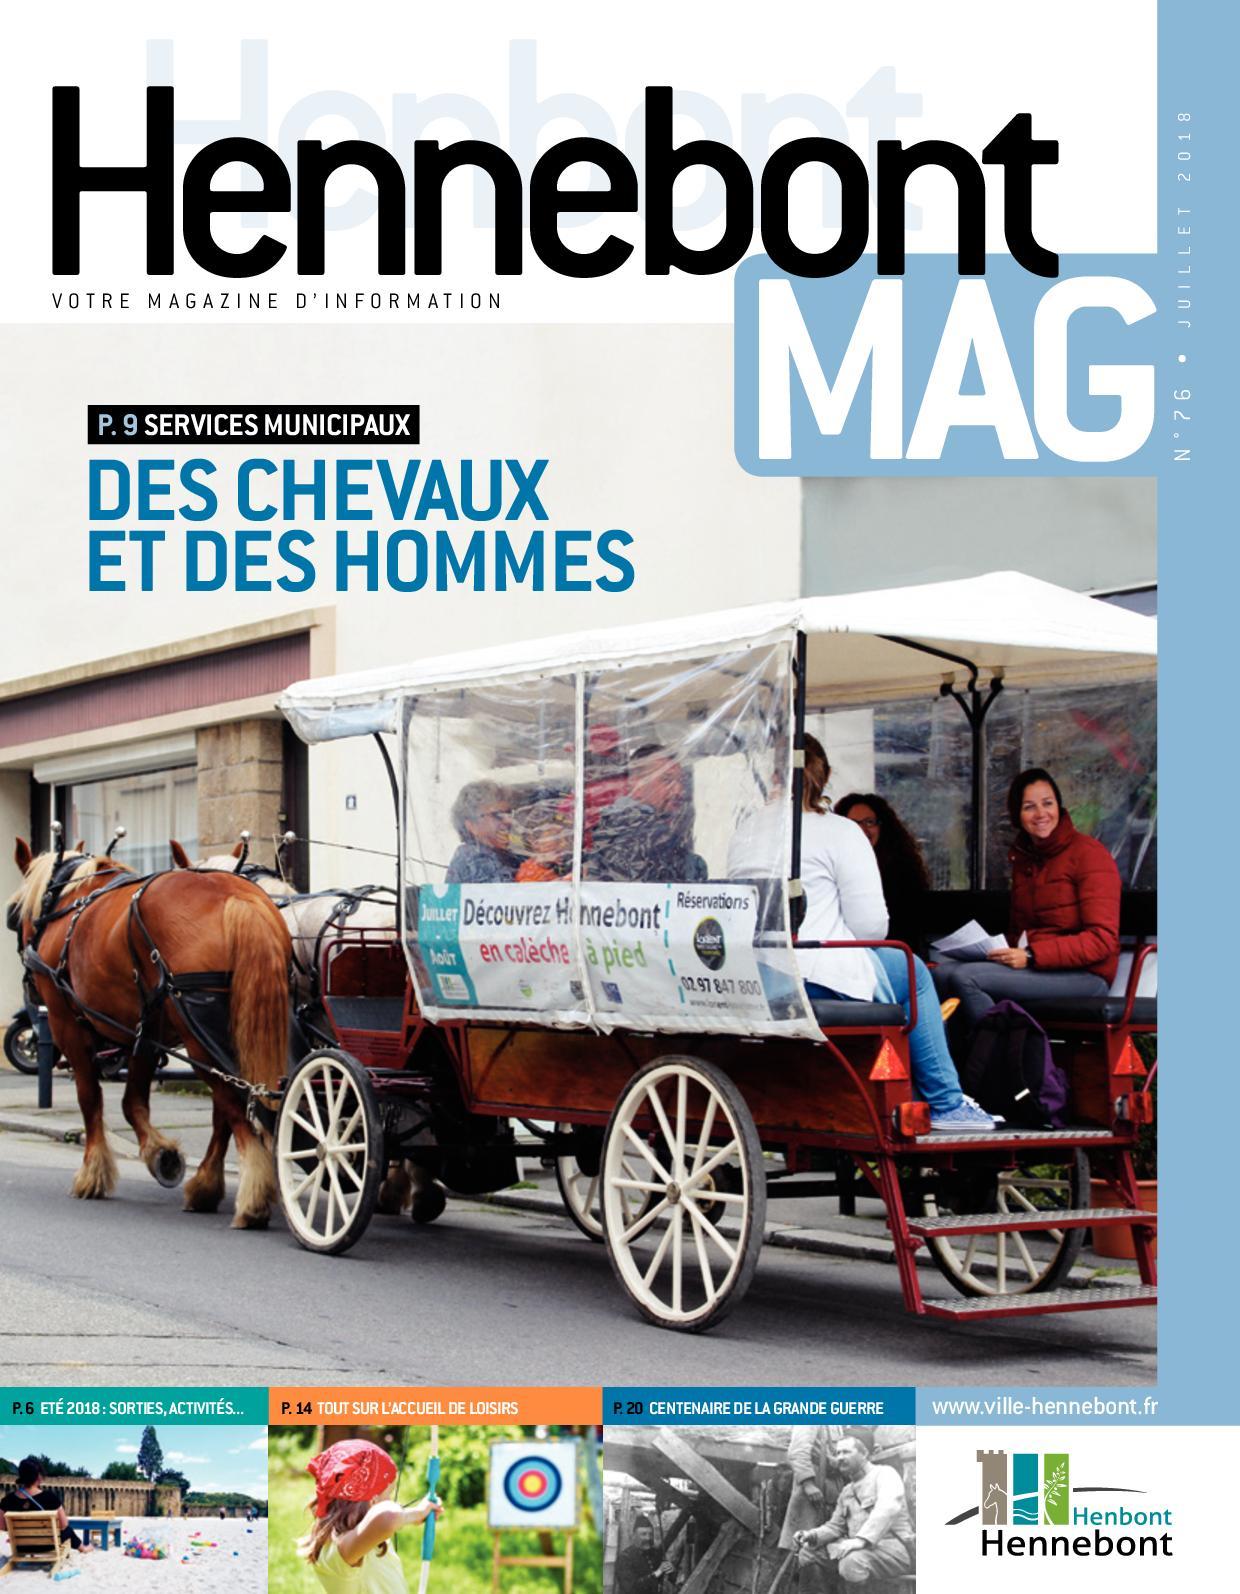 Calaméo - Hennebont Mag Juillet 2018 avec Horaire Piscine Hennebont